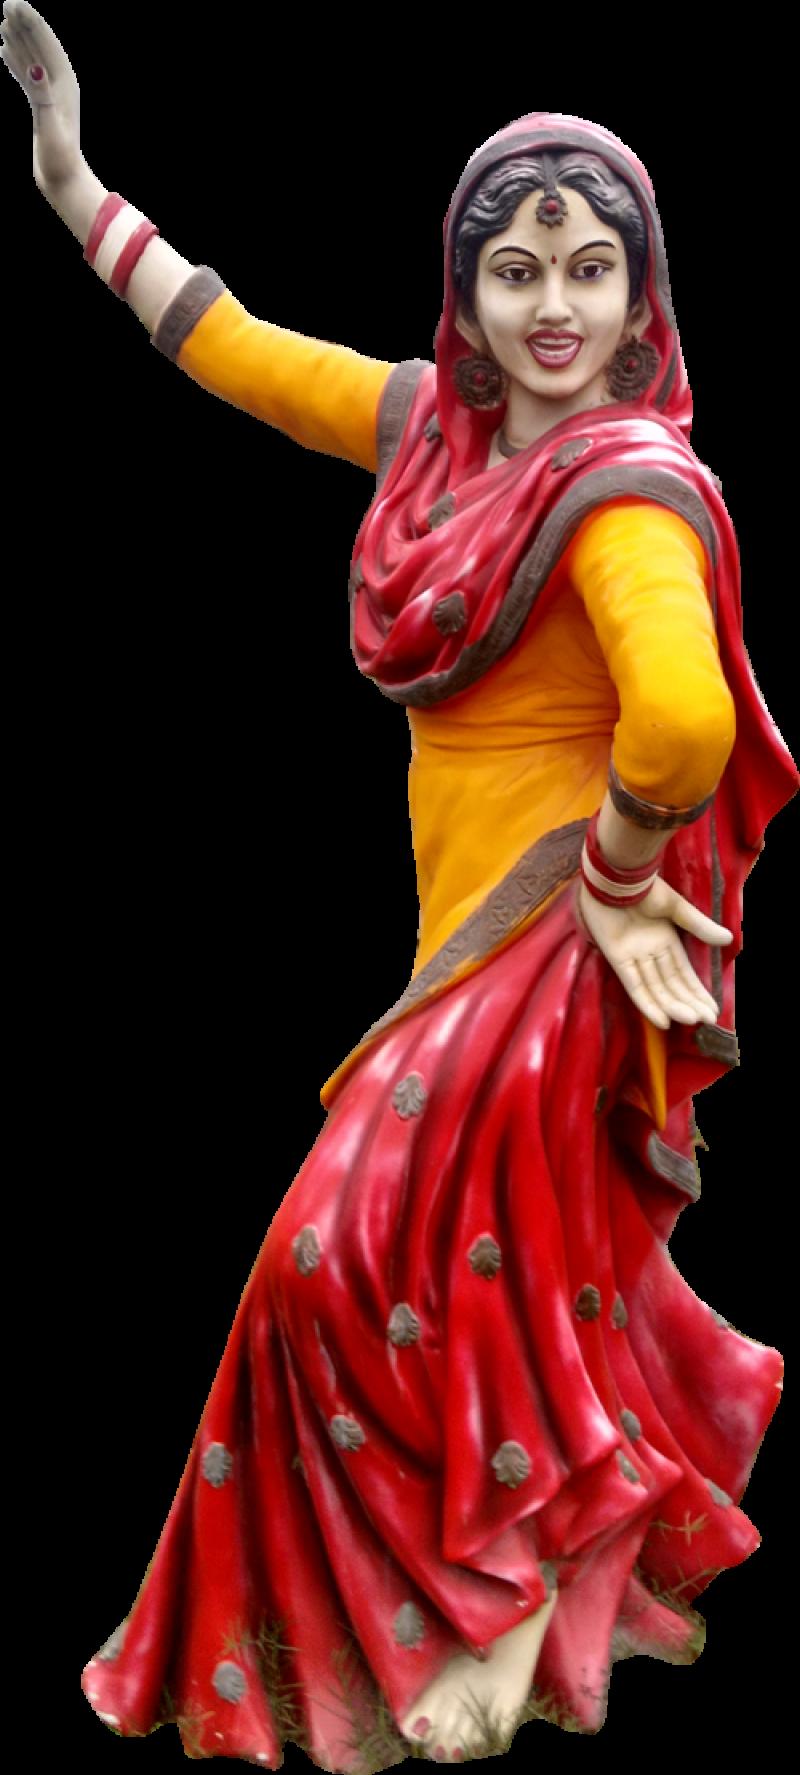 Punjab Gidha Statue Chandigarh Mohali Panchukula PNG Image